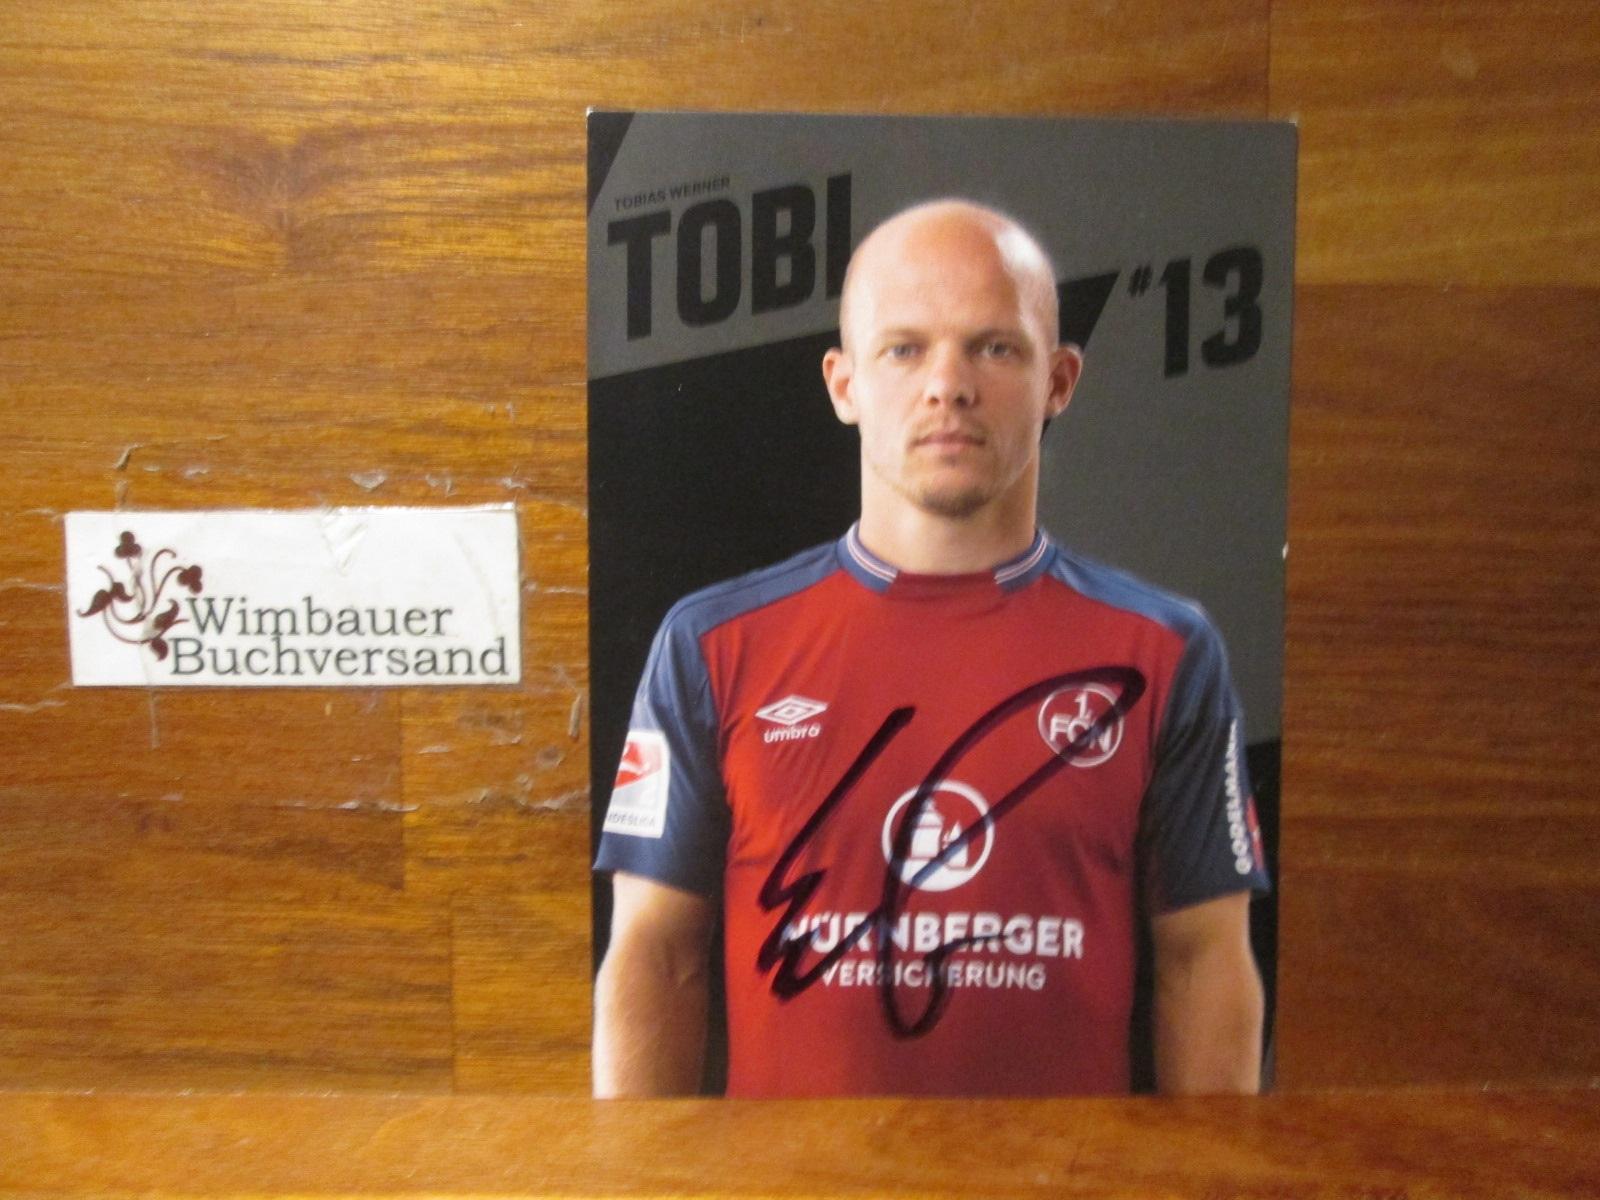 Werner, Tobias : Original Autogramm Tobias Werner 1.FC Nürnberg /// Autogramm Autograph signiert signed signee